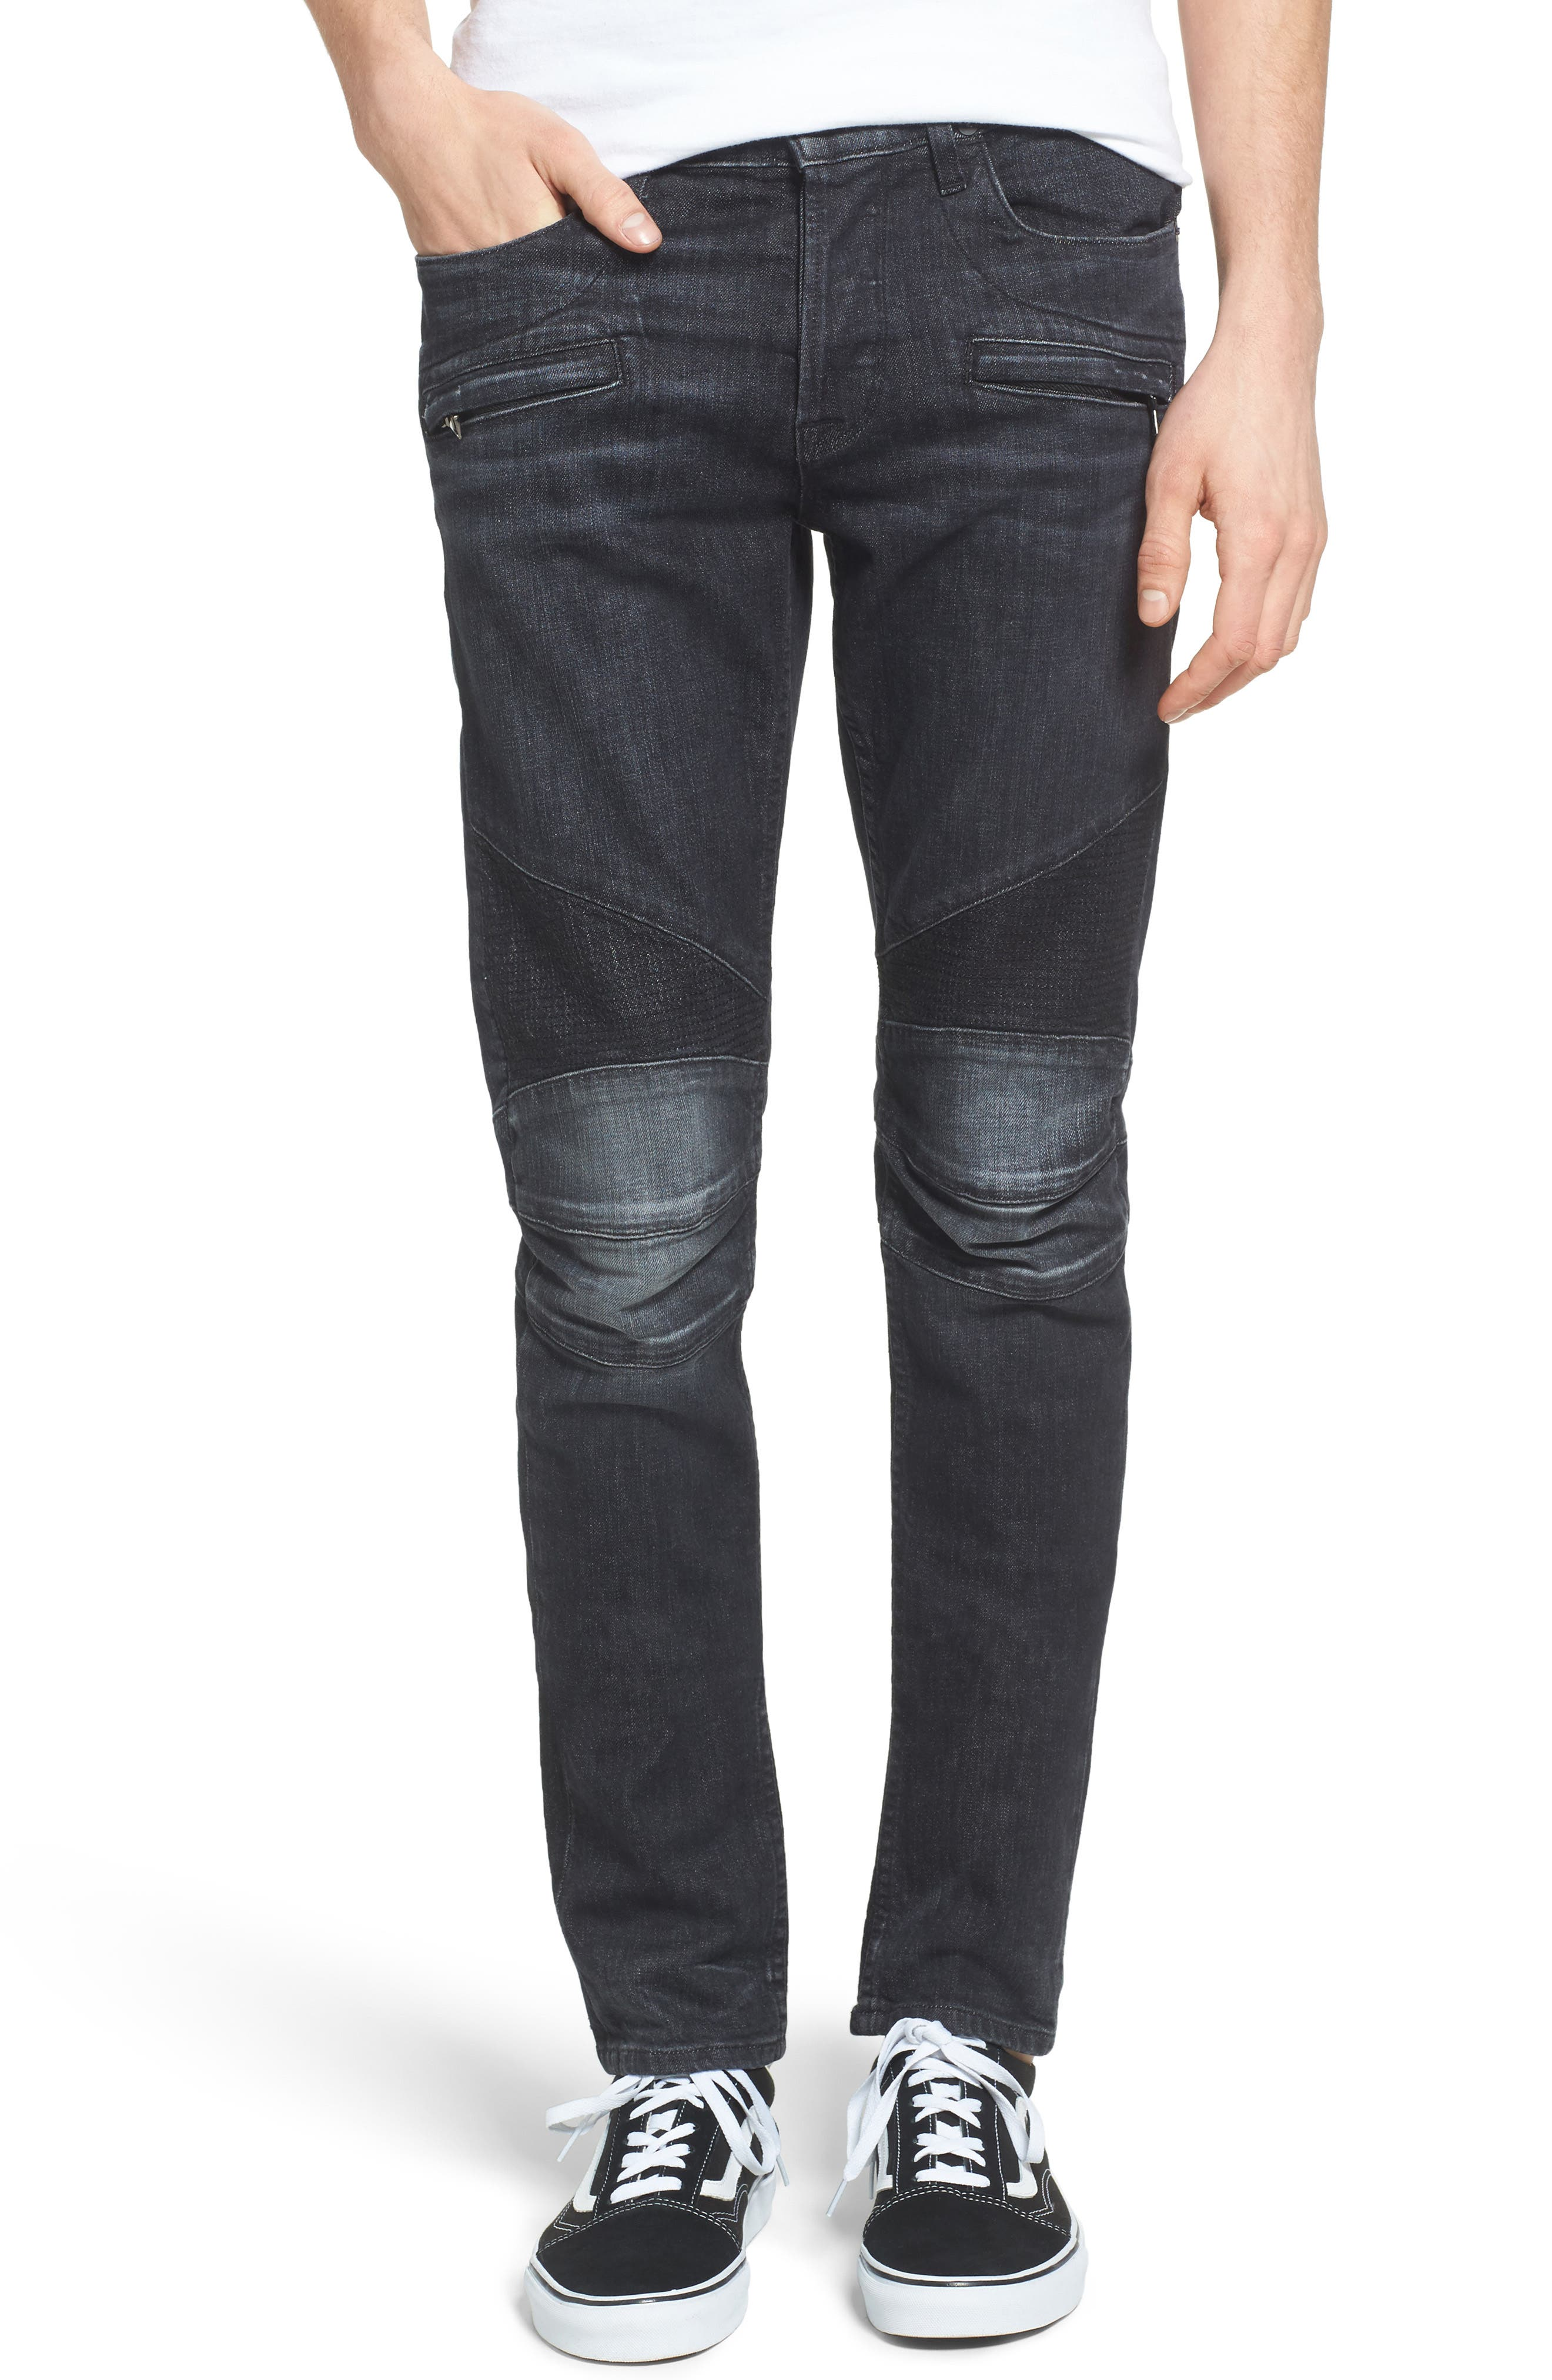 Blinder Skinny Fit Moto Jeans,                             Main thumbnail 1, color,                             001